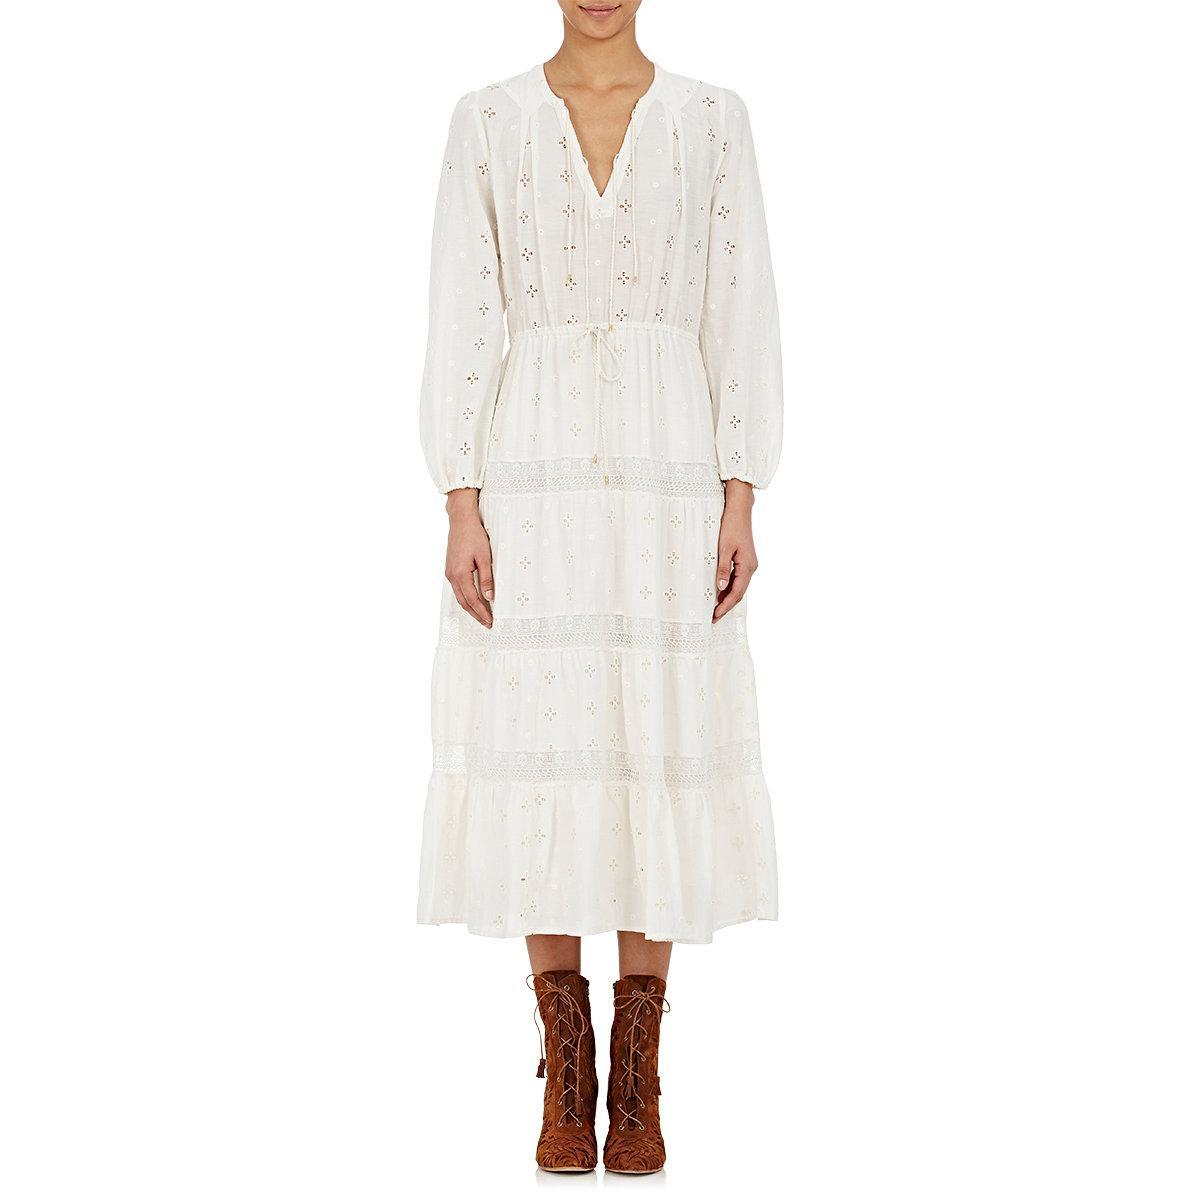 Lyst - Ulla Johnson Clementine Eyelet Cotton-Silk Maxi Dress in White